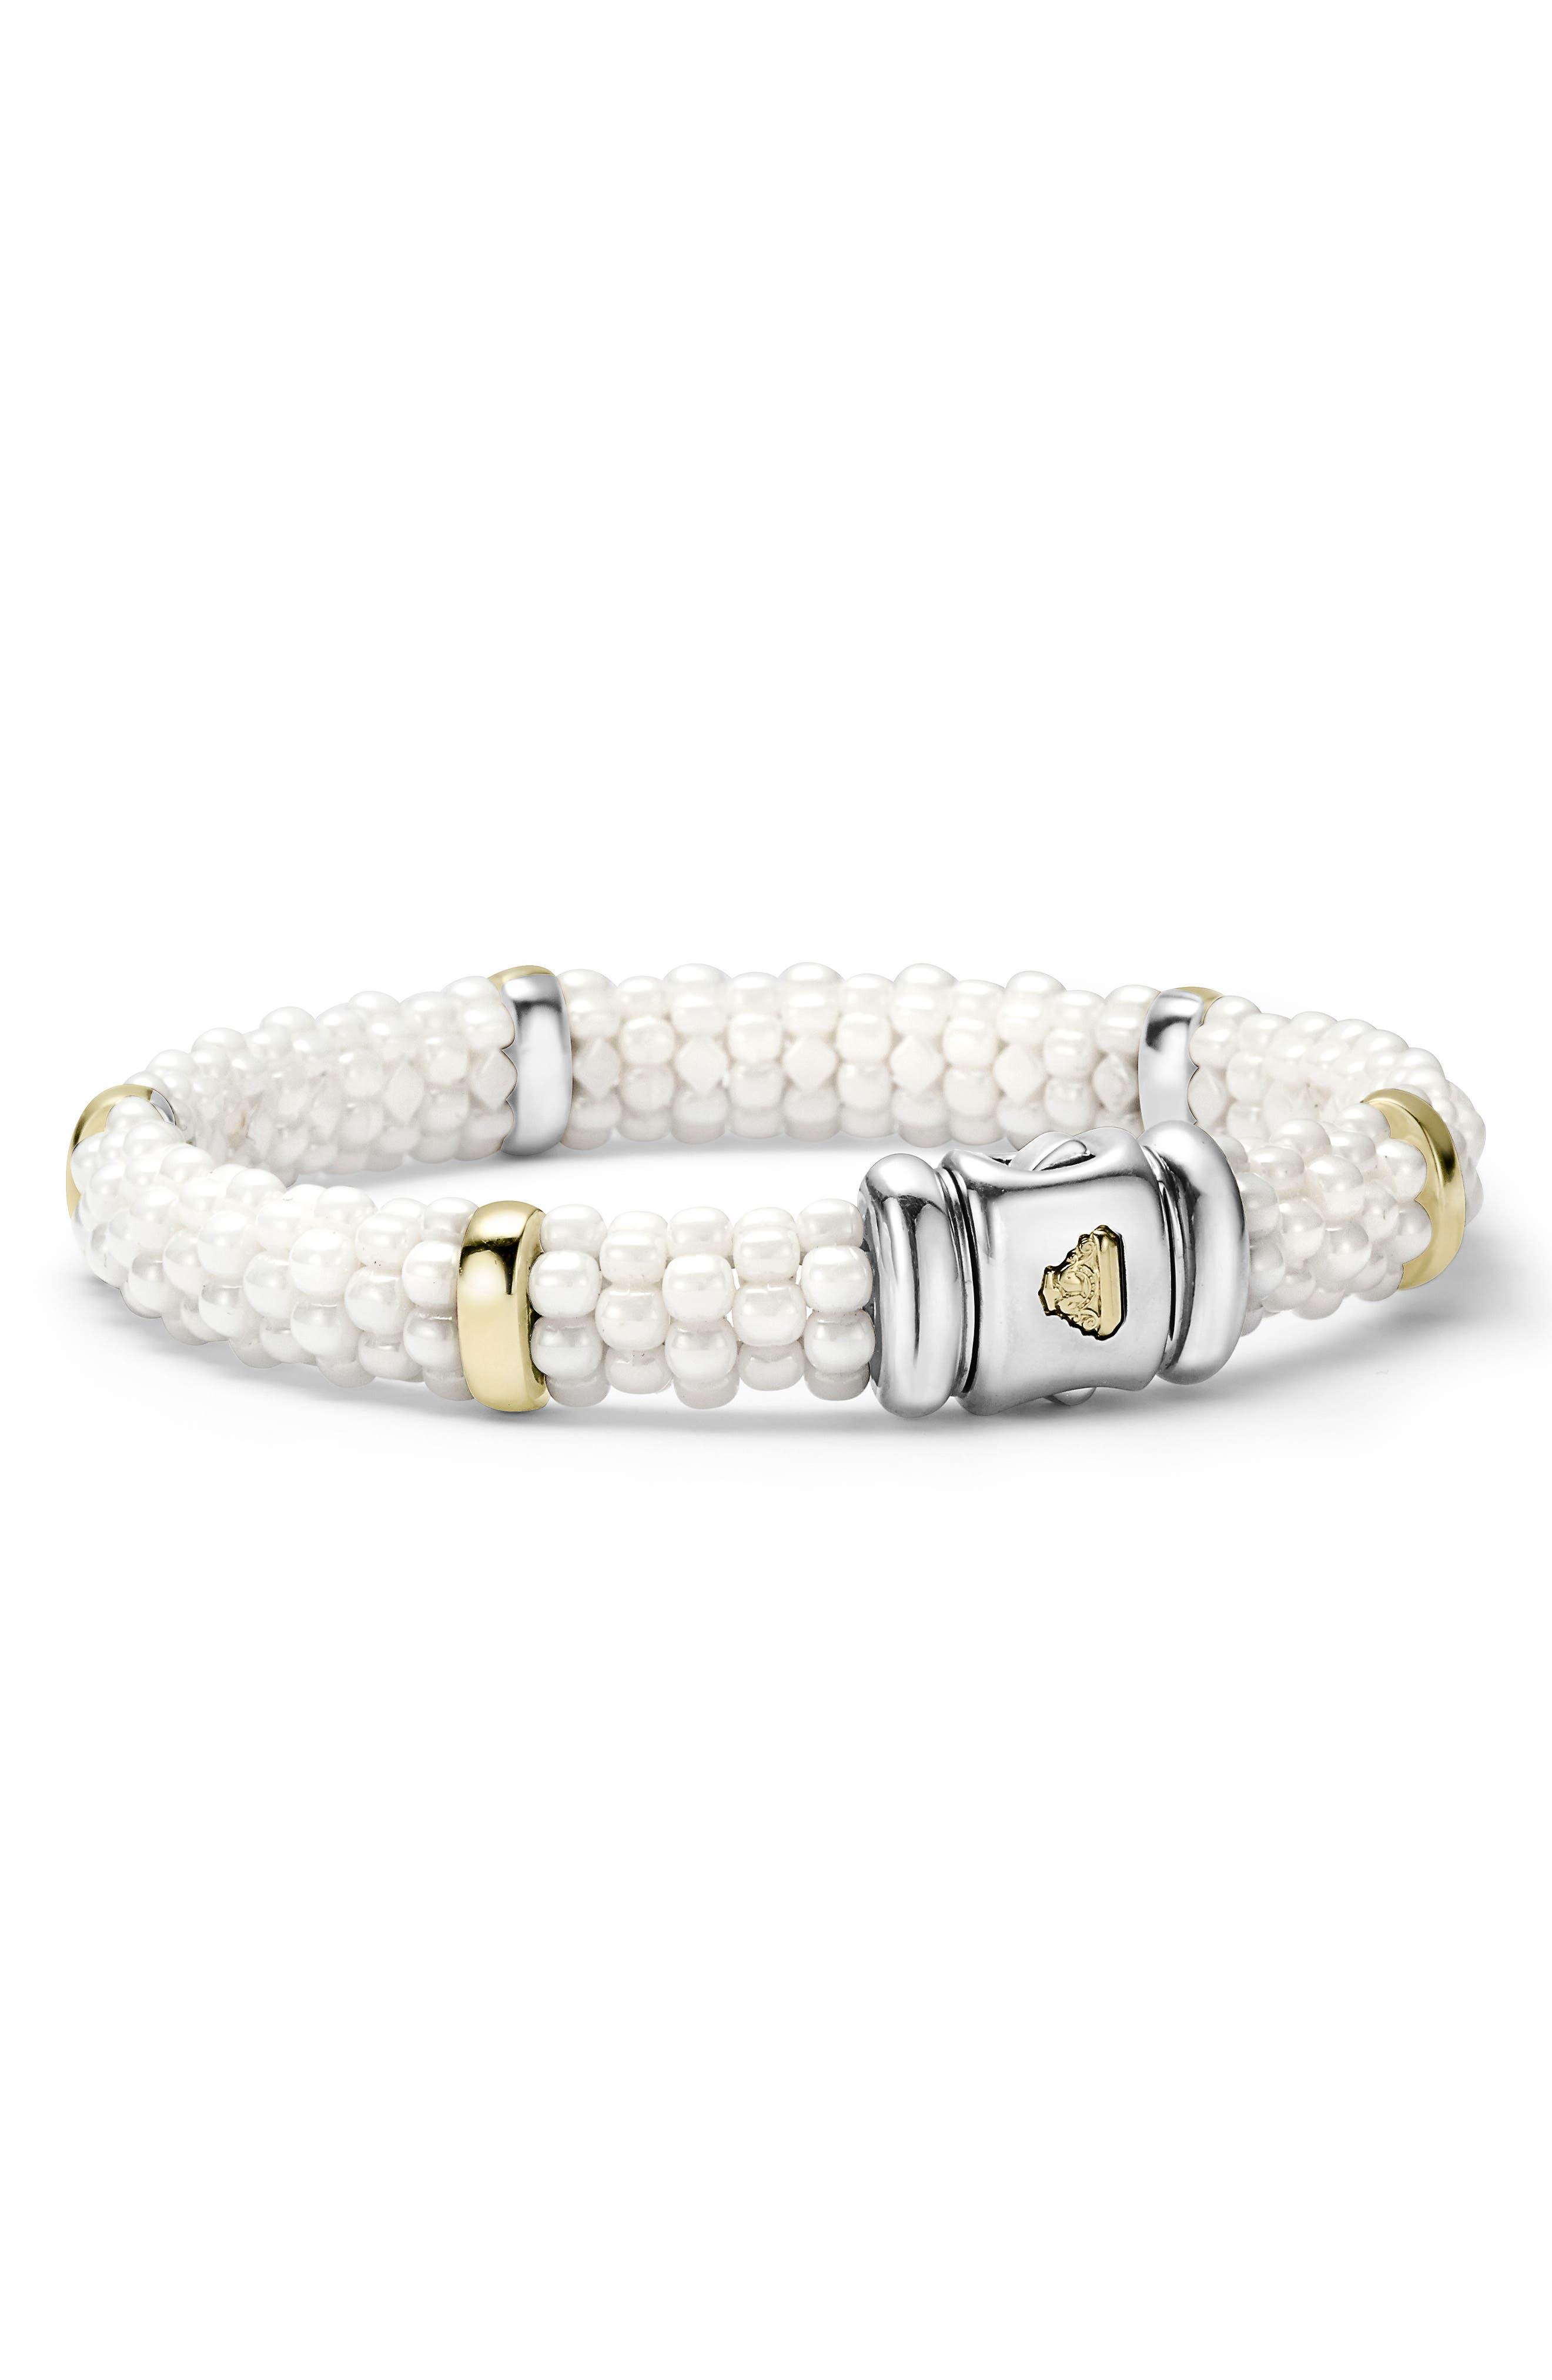 White Caviar Station Bracelet,                             Alternate thumbnail 3, color,                             WHITE CAVIAR